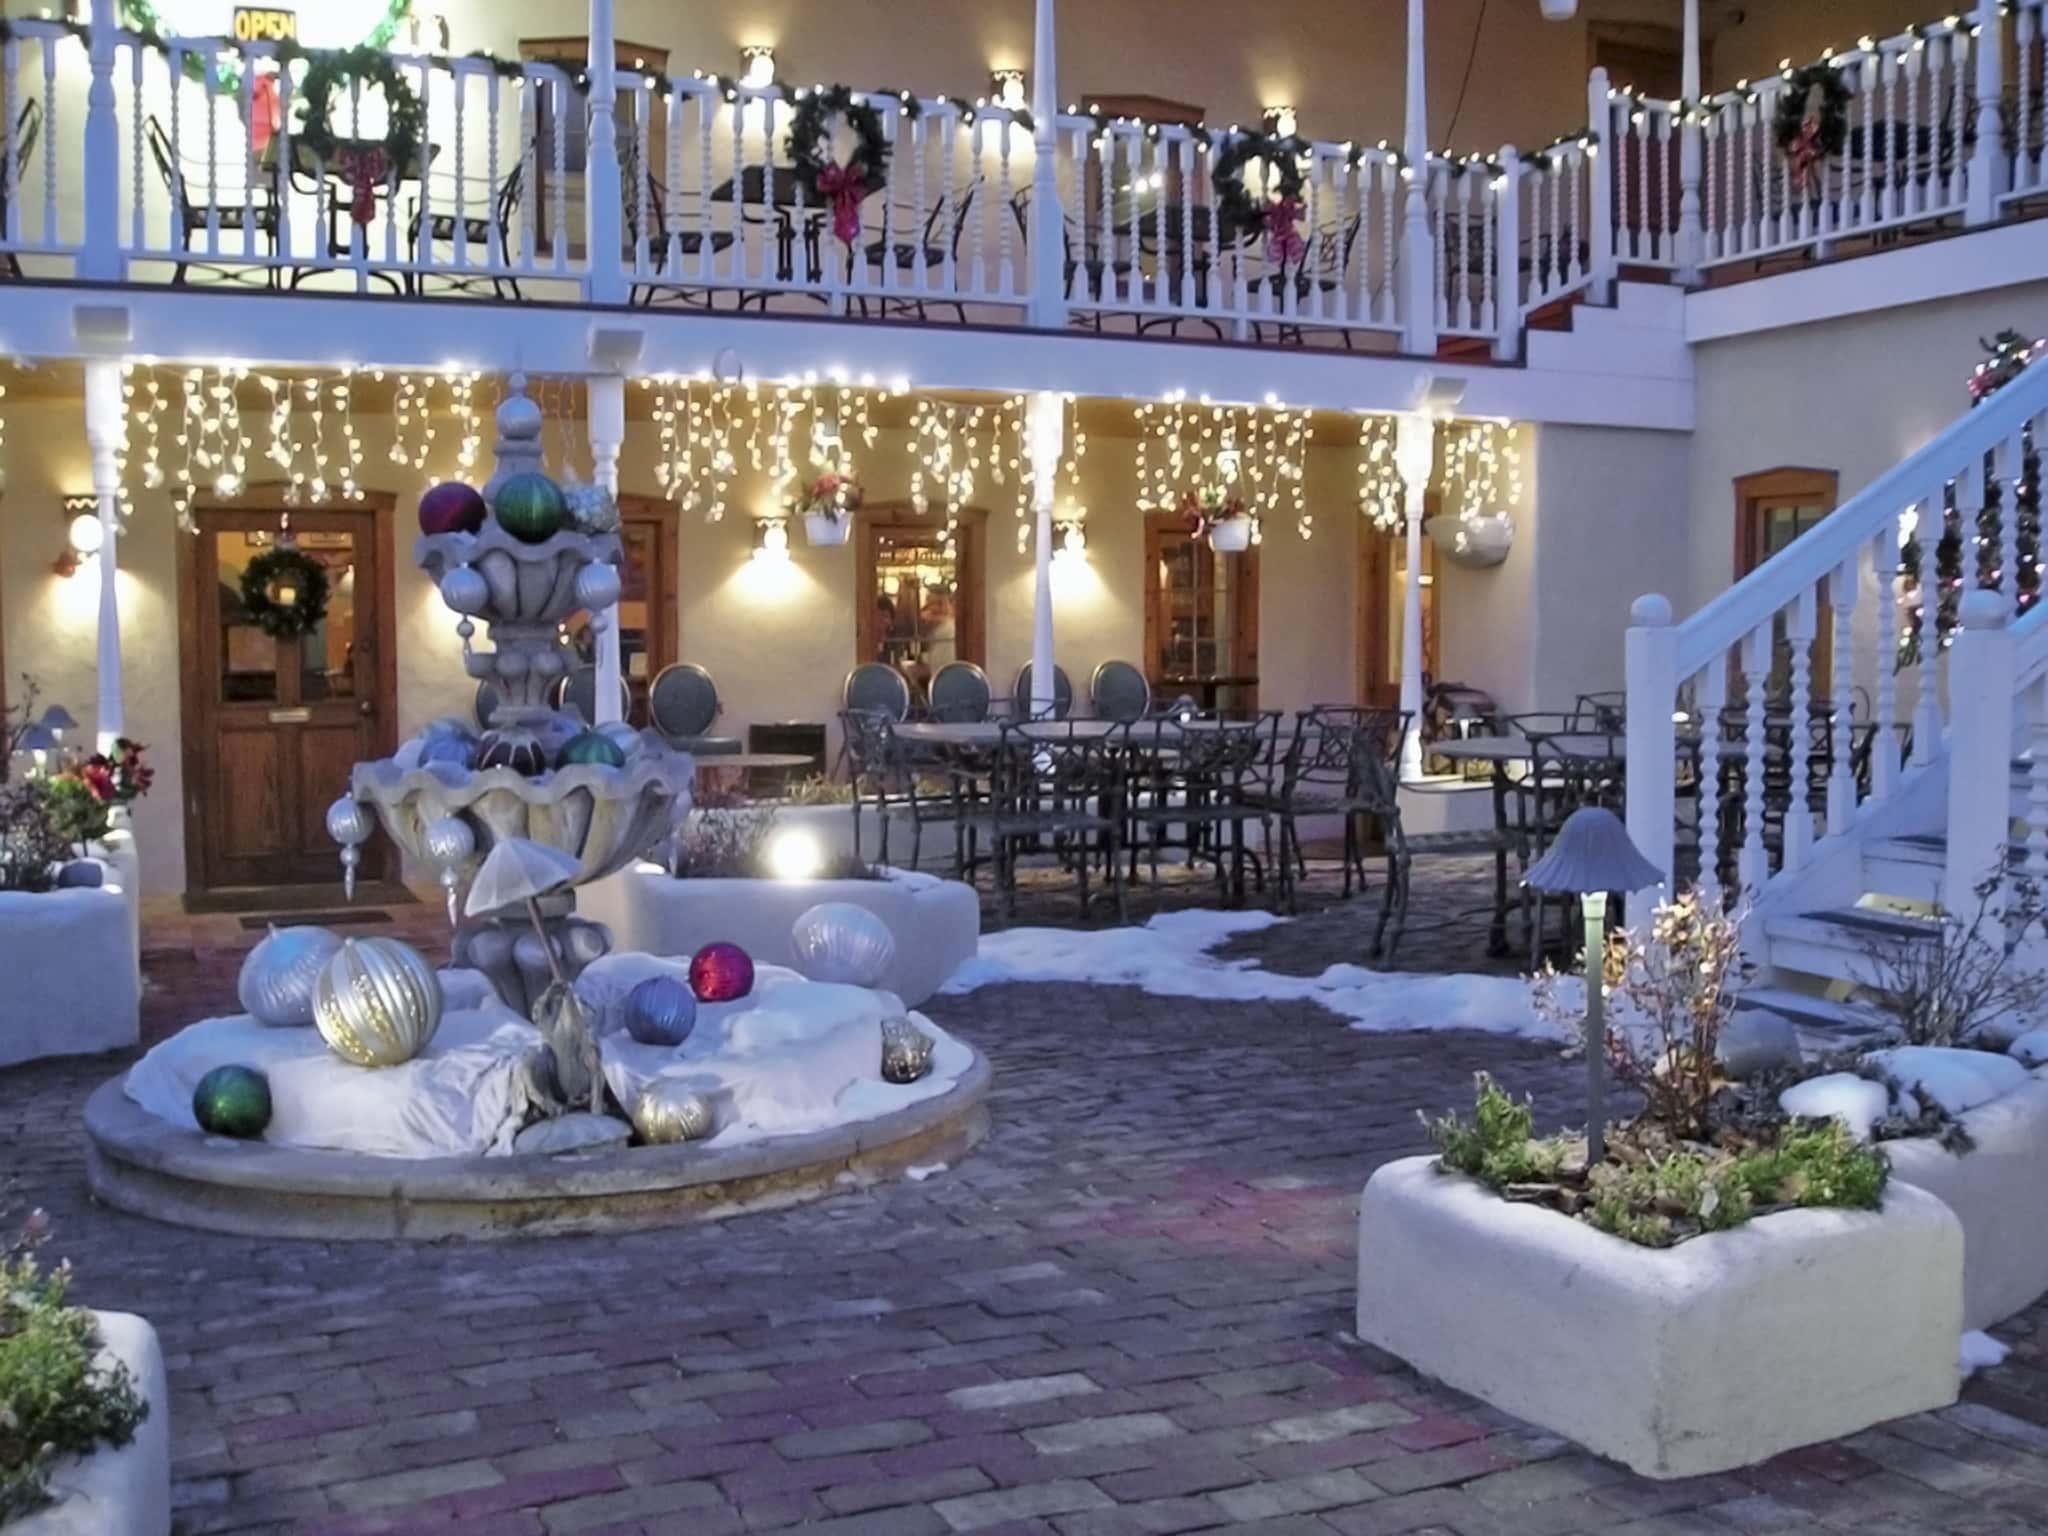 Restaurant Christmas Decorations Ideas.Christmas Decorations On A Restaurant Patio Jenn Davida